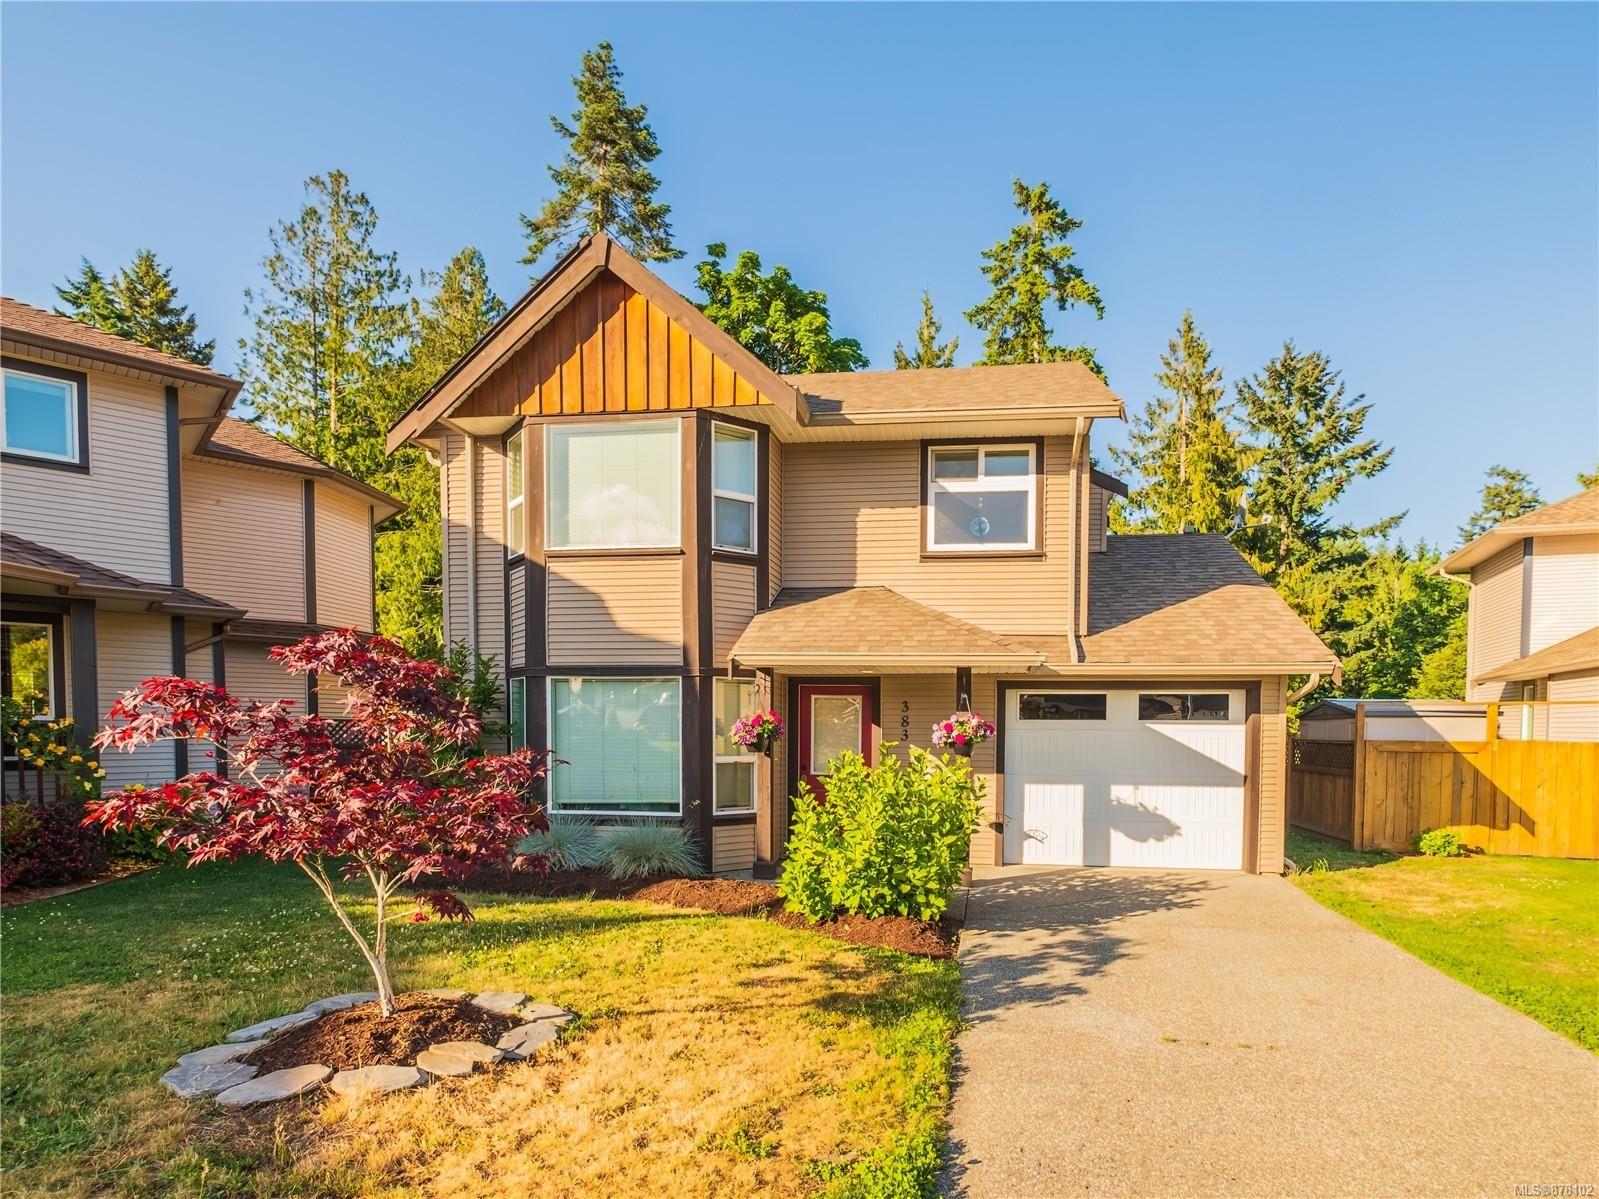 Main Photo: 383 Applewood Cres in : Na South Nanaimo House for sale (Nanaimo)  : MLS®# 878102